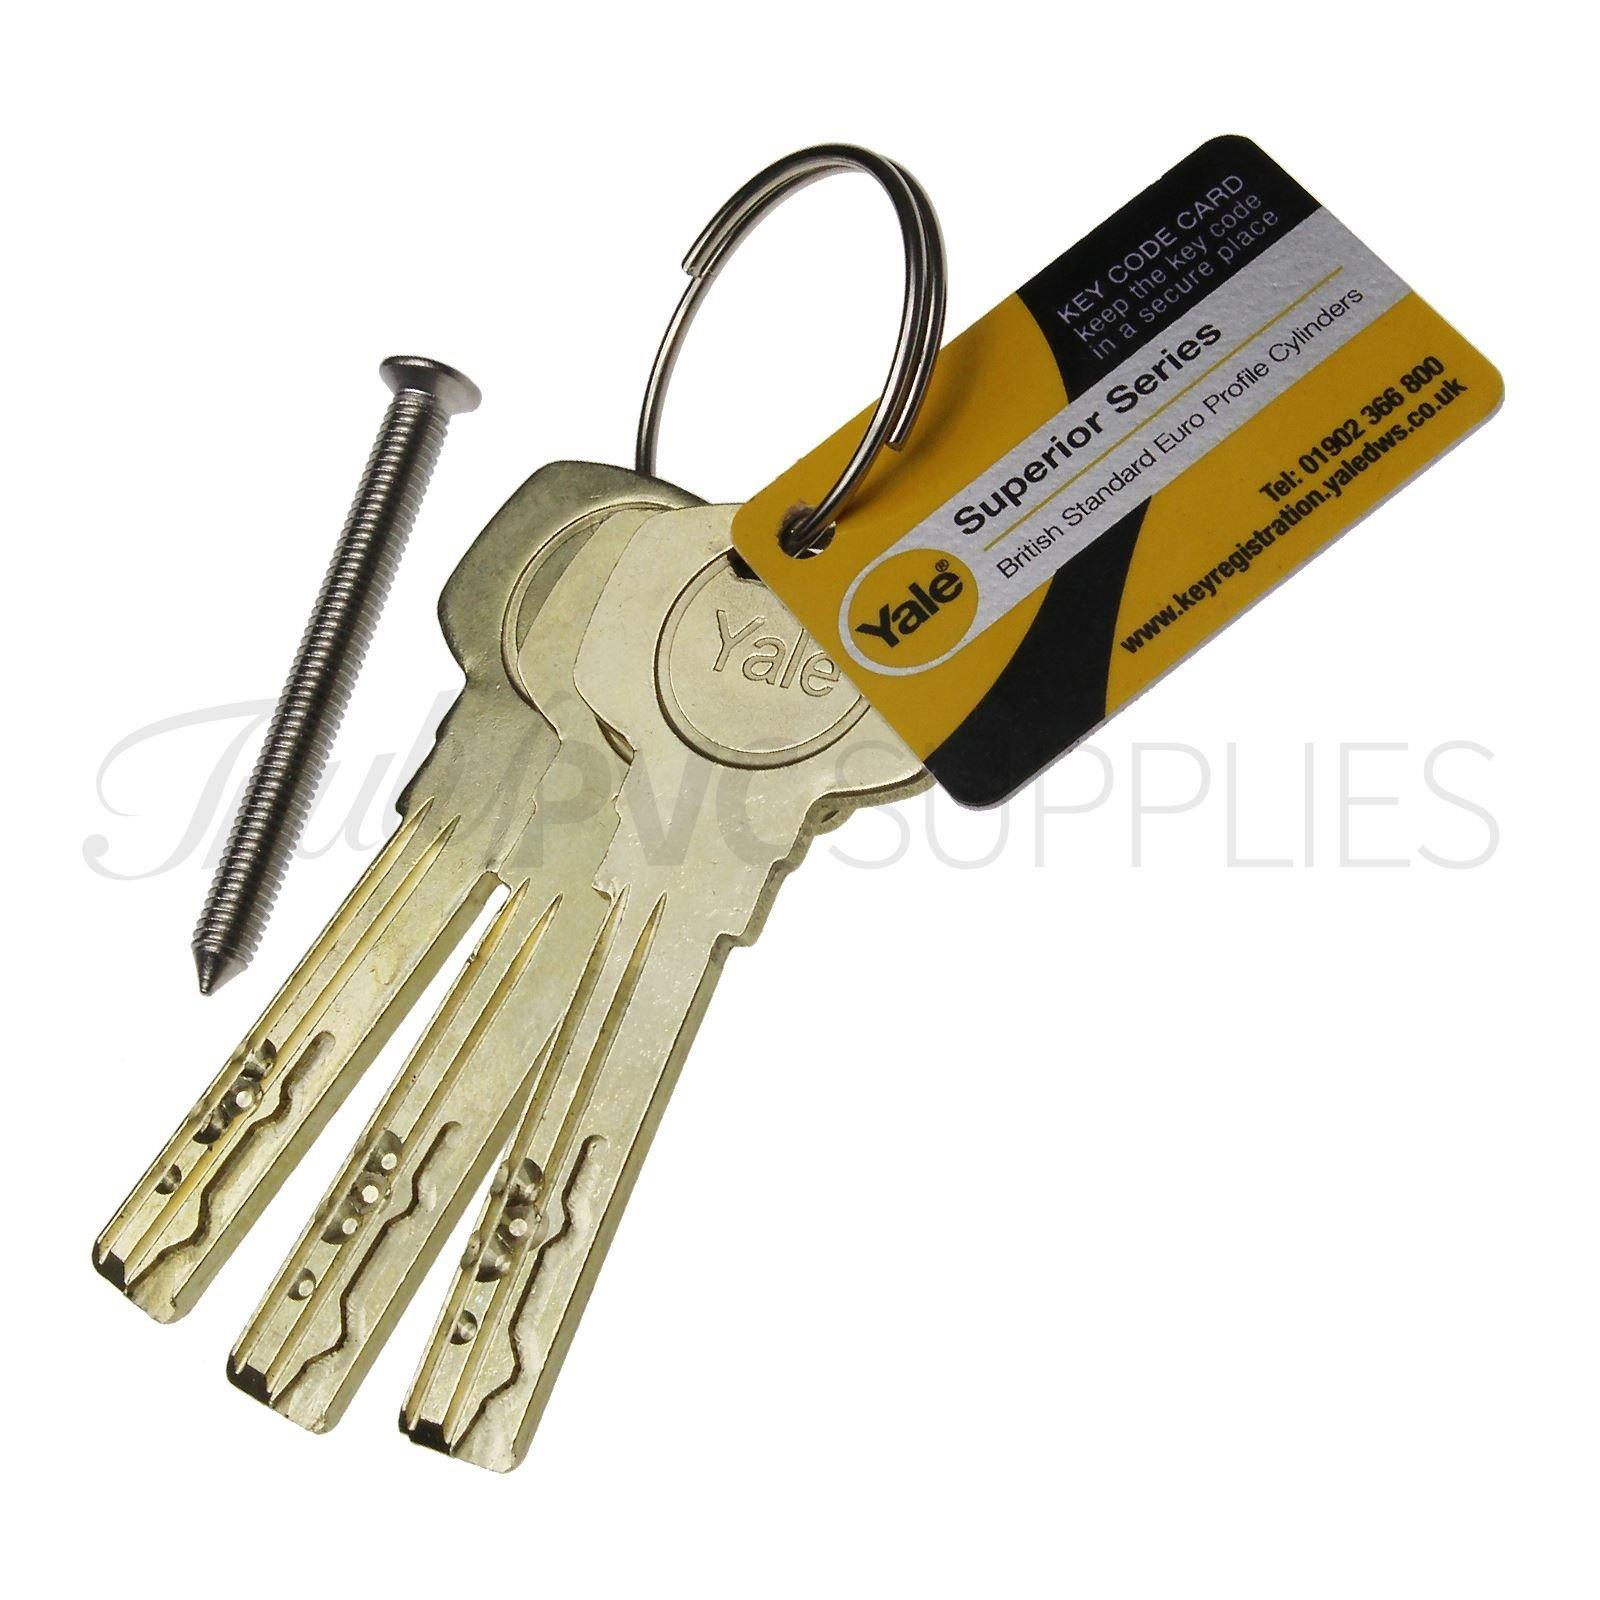 45//45 5 total 2 Extra Keys 90mm Nickel YALE Platinum 3 Star Euro Cylinder Anti Snap Bump High Security uPVC Door Barrel TS2007:2013 Lock